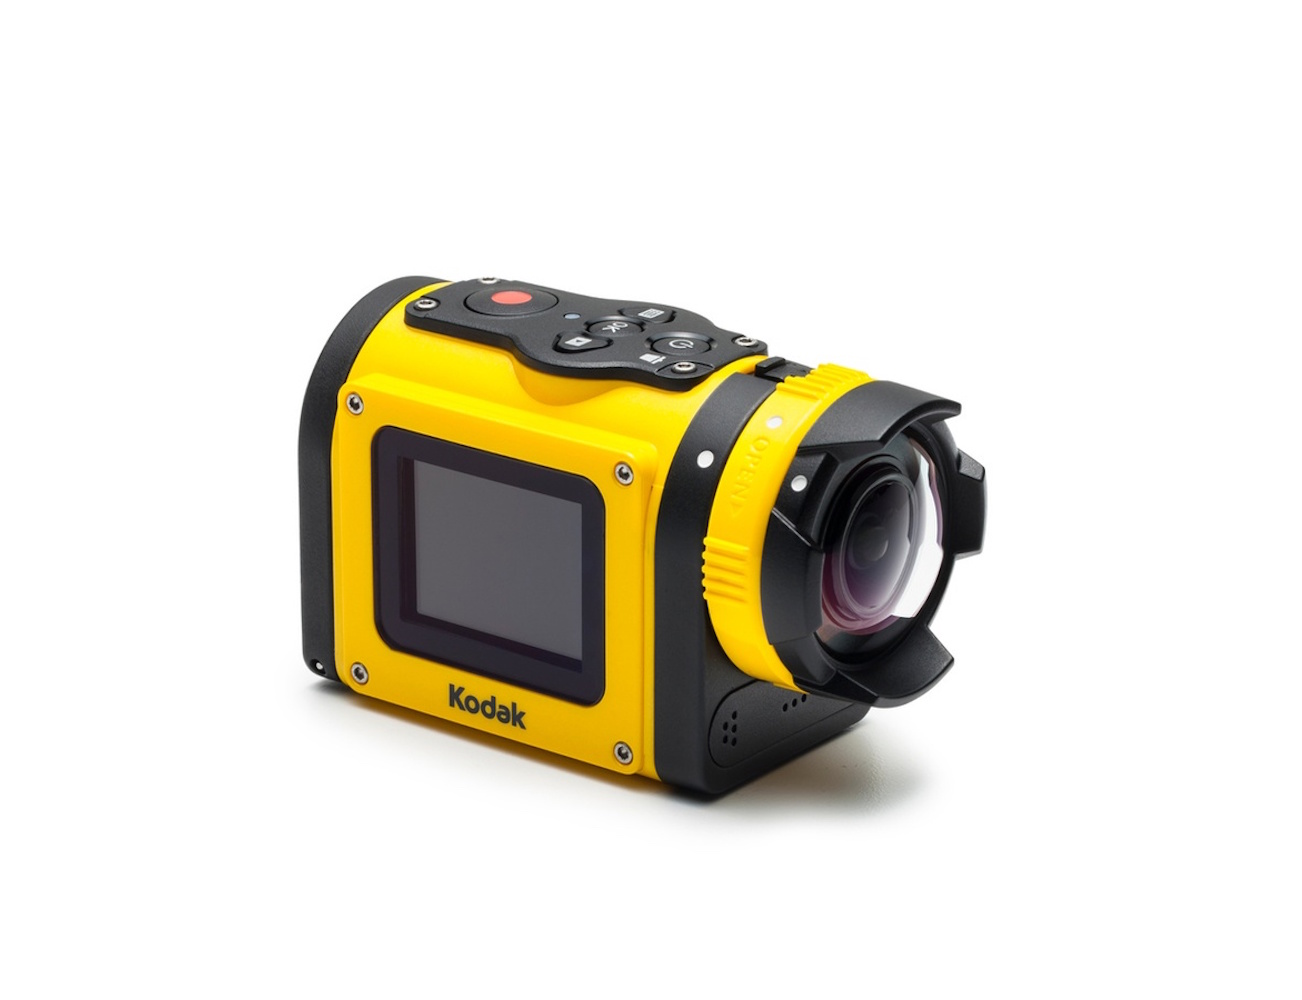 kodak-pixpro-sp1-action-cam-and-explorer-pack-03